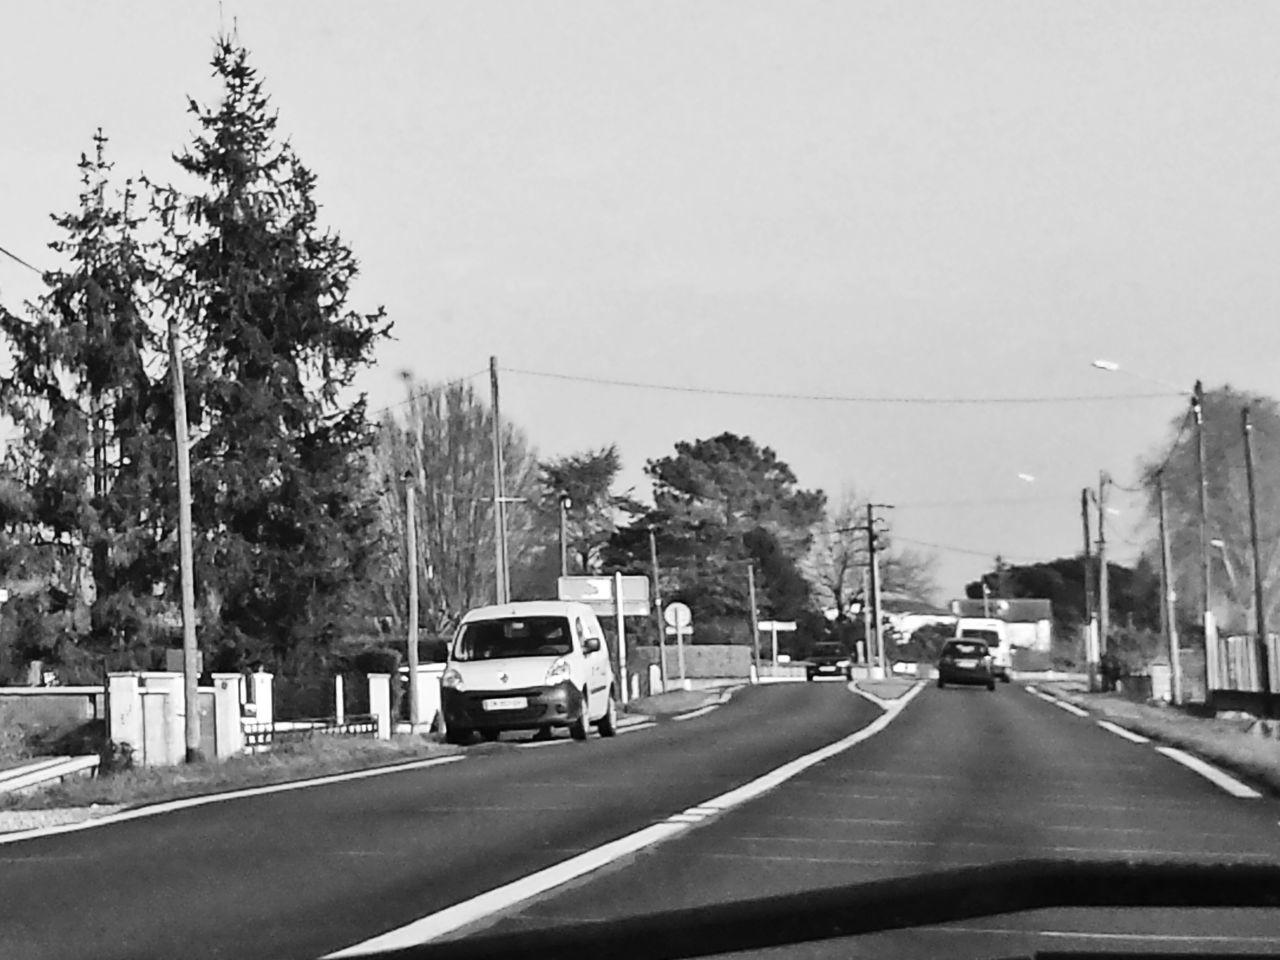 Street Against Clear Sky Seen Through Car Windshield